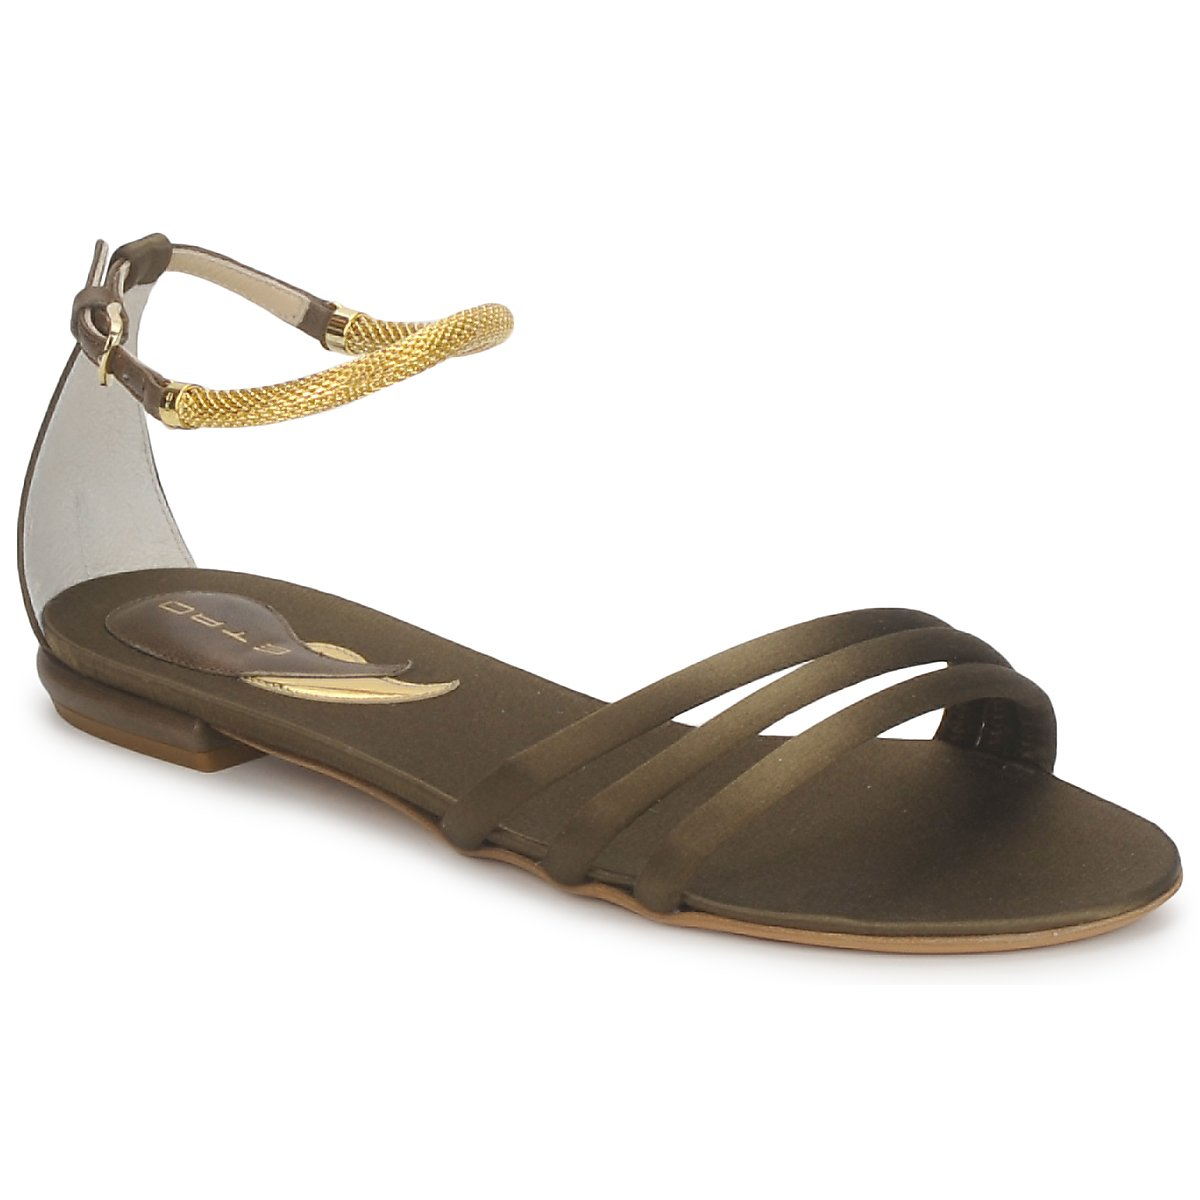 Sandale Etro 3461 Militaire